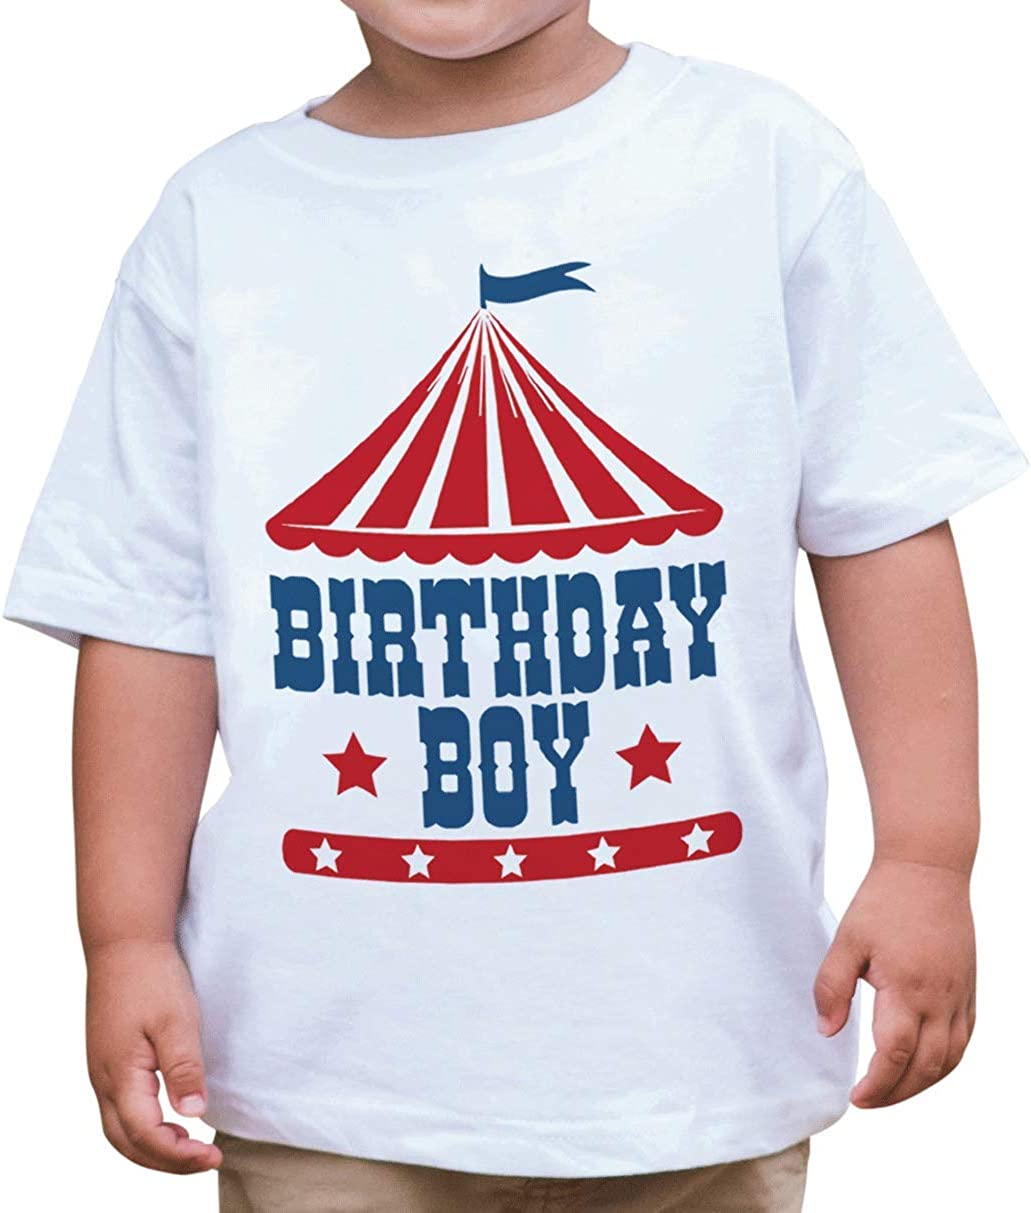 7 ate 9 Apparel Boy's Birthday Circus T-Shirt